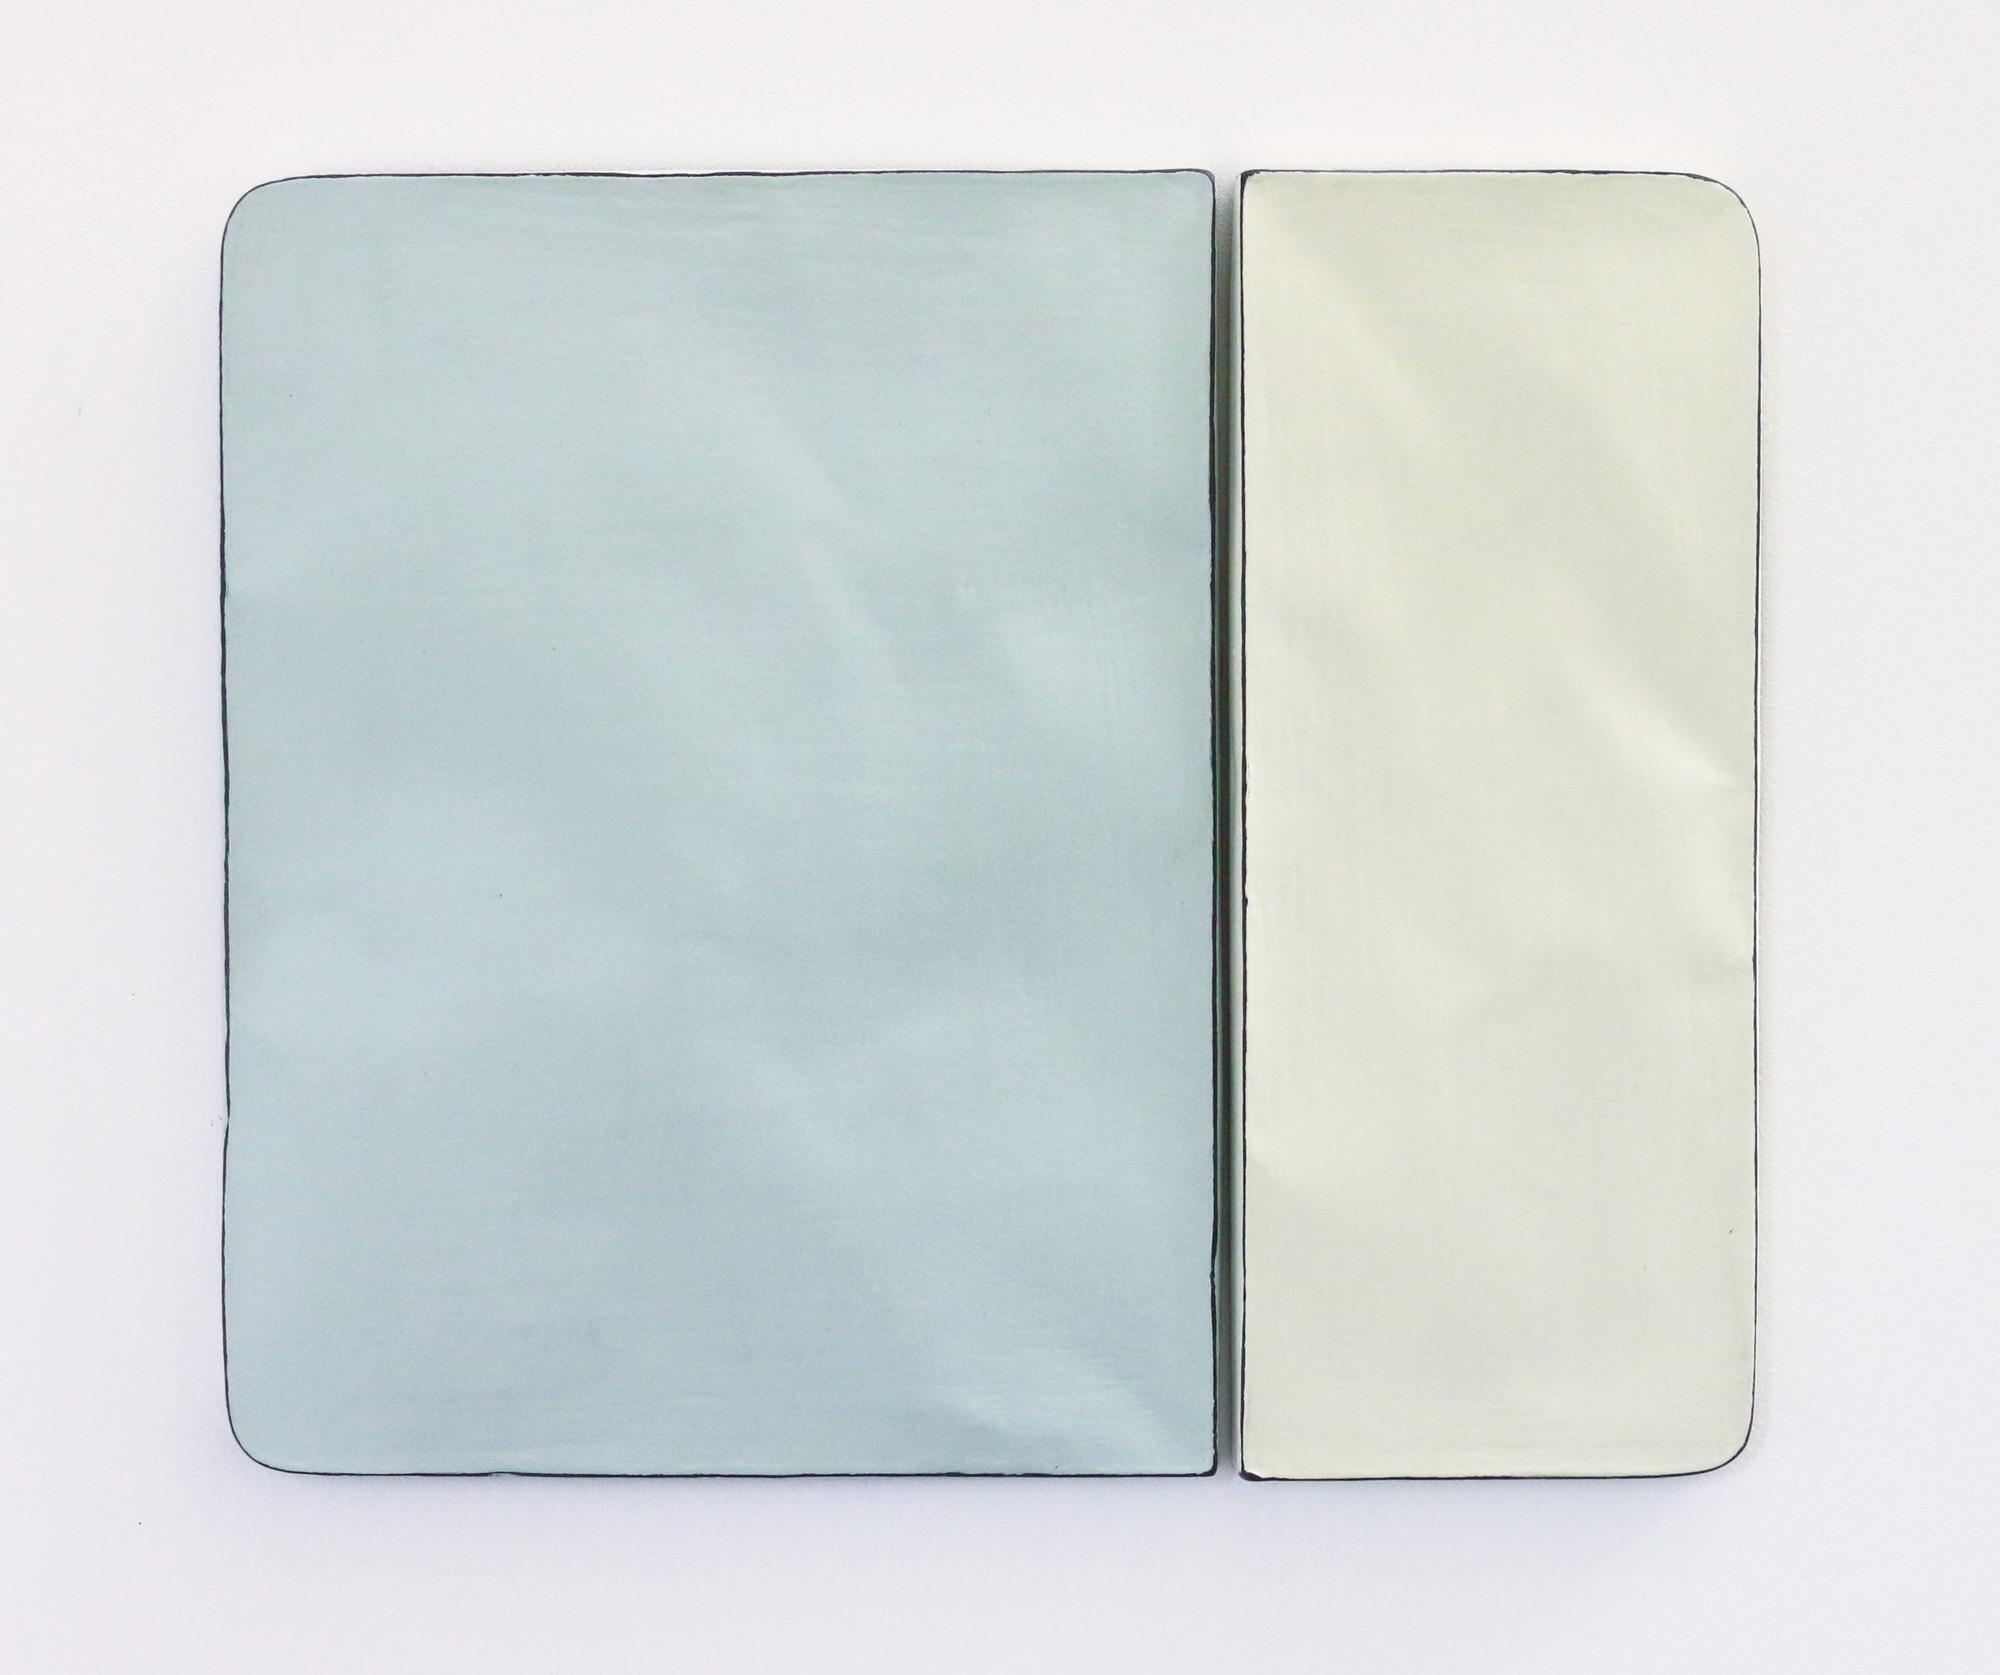 Johan De Wit, Untitled, 2018, Paper, Resin, Marble, Acrylic, 35.5 x 29.7 x 1.5 cm, Affinity Art